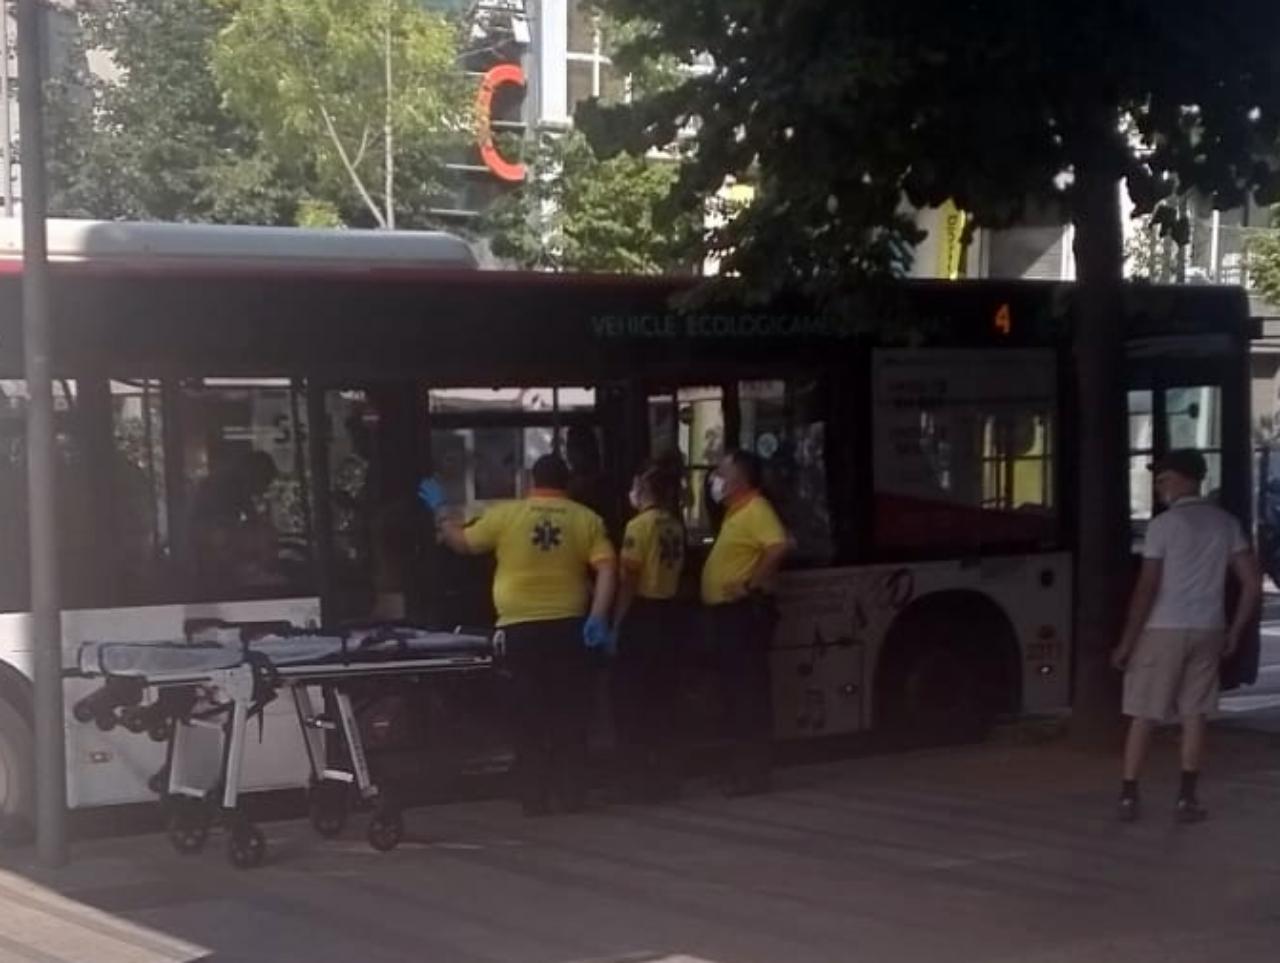 Atenció dels sanitaris en un autobús de Terrassa | javier Juárez